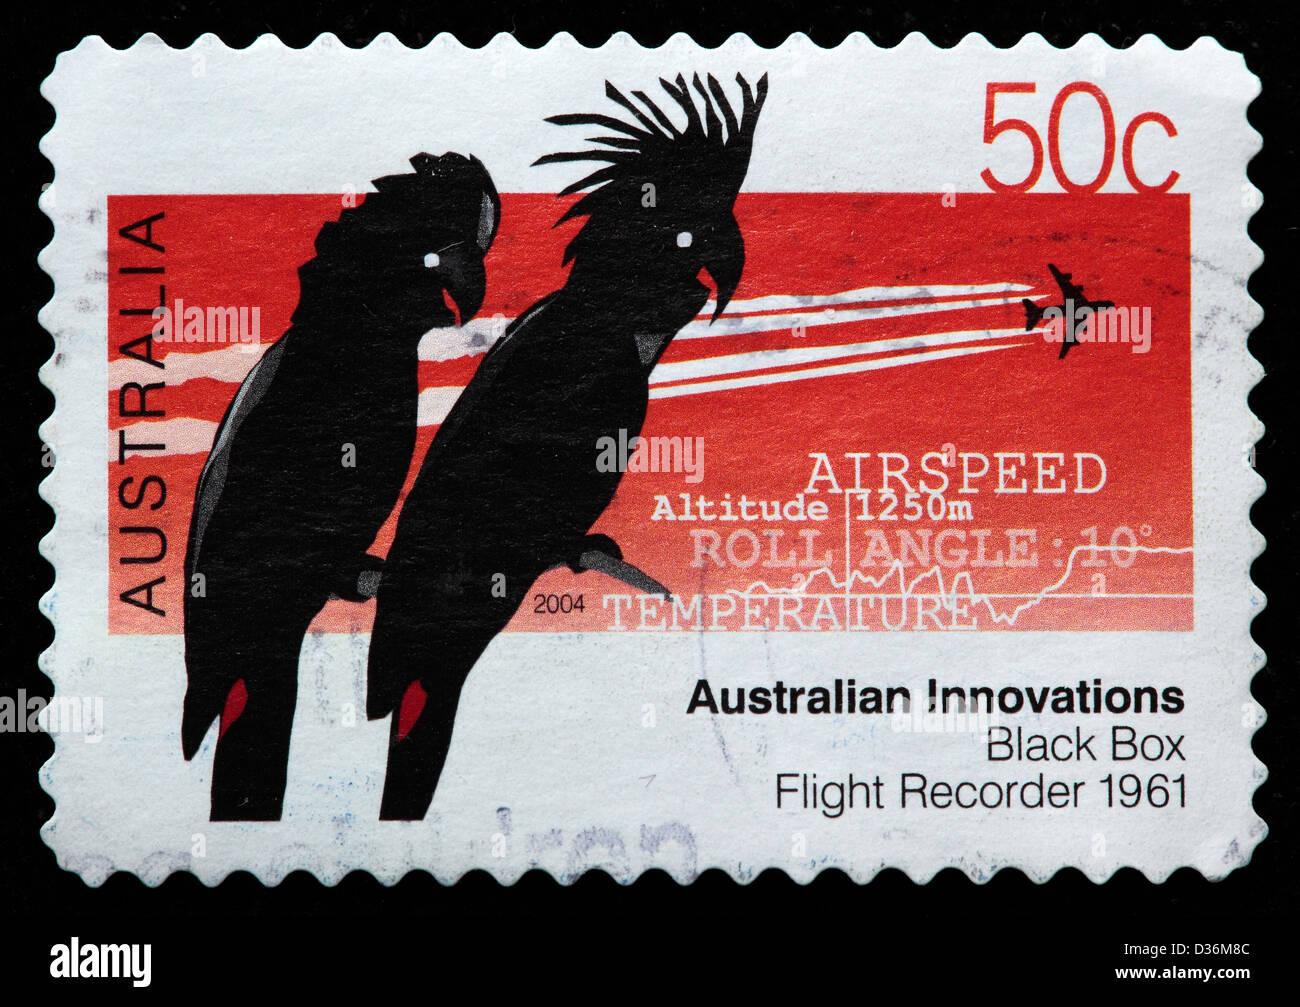 Black box flight recorder (1961), Australian innovations, postage stamp, Australia, 2004 - Stock Image